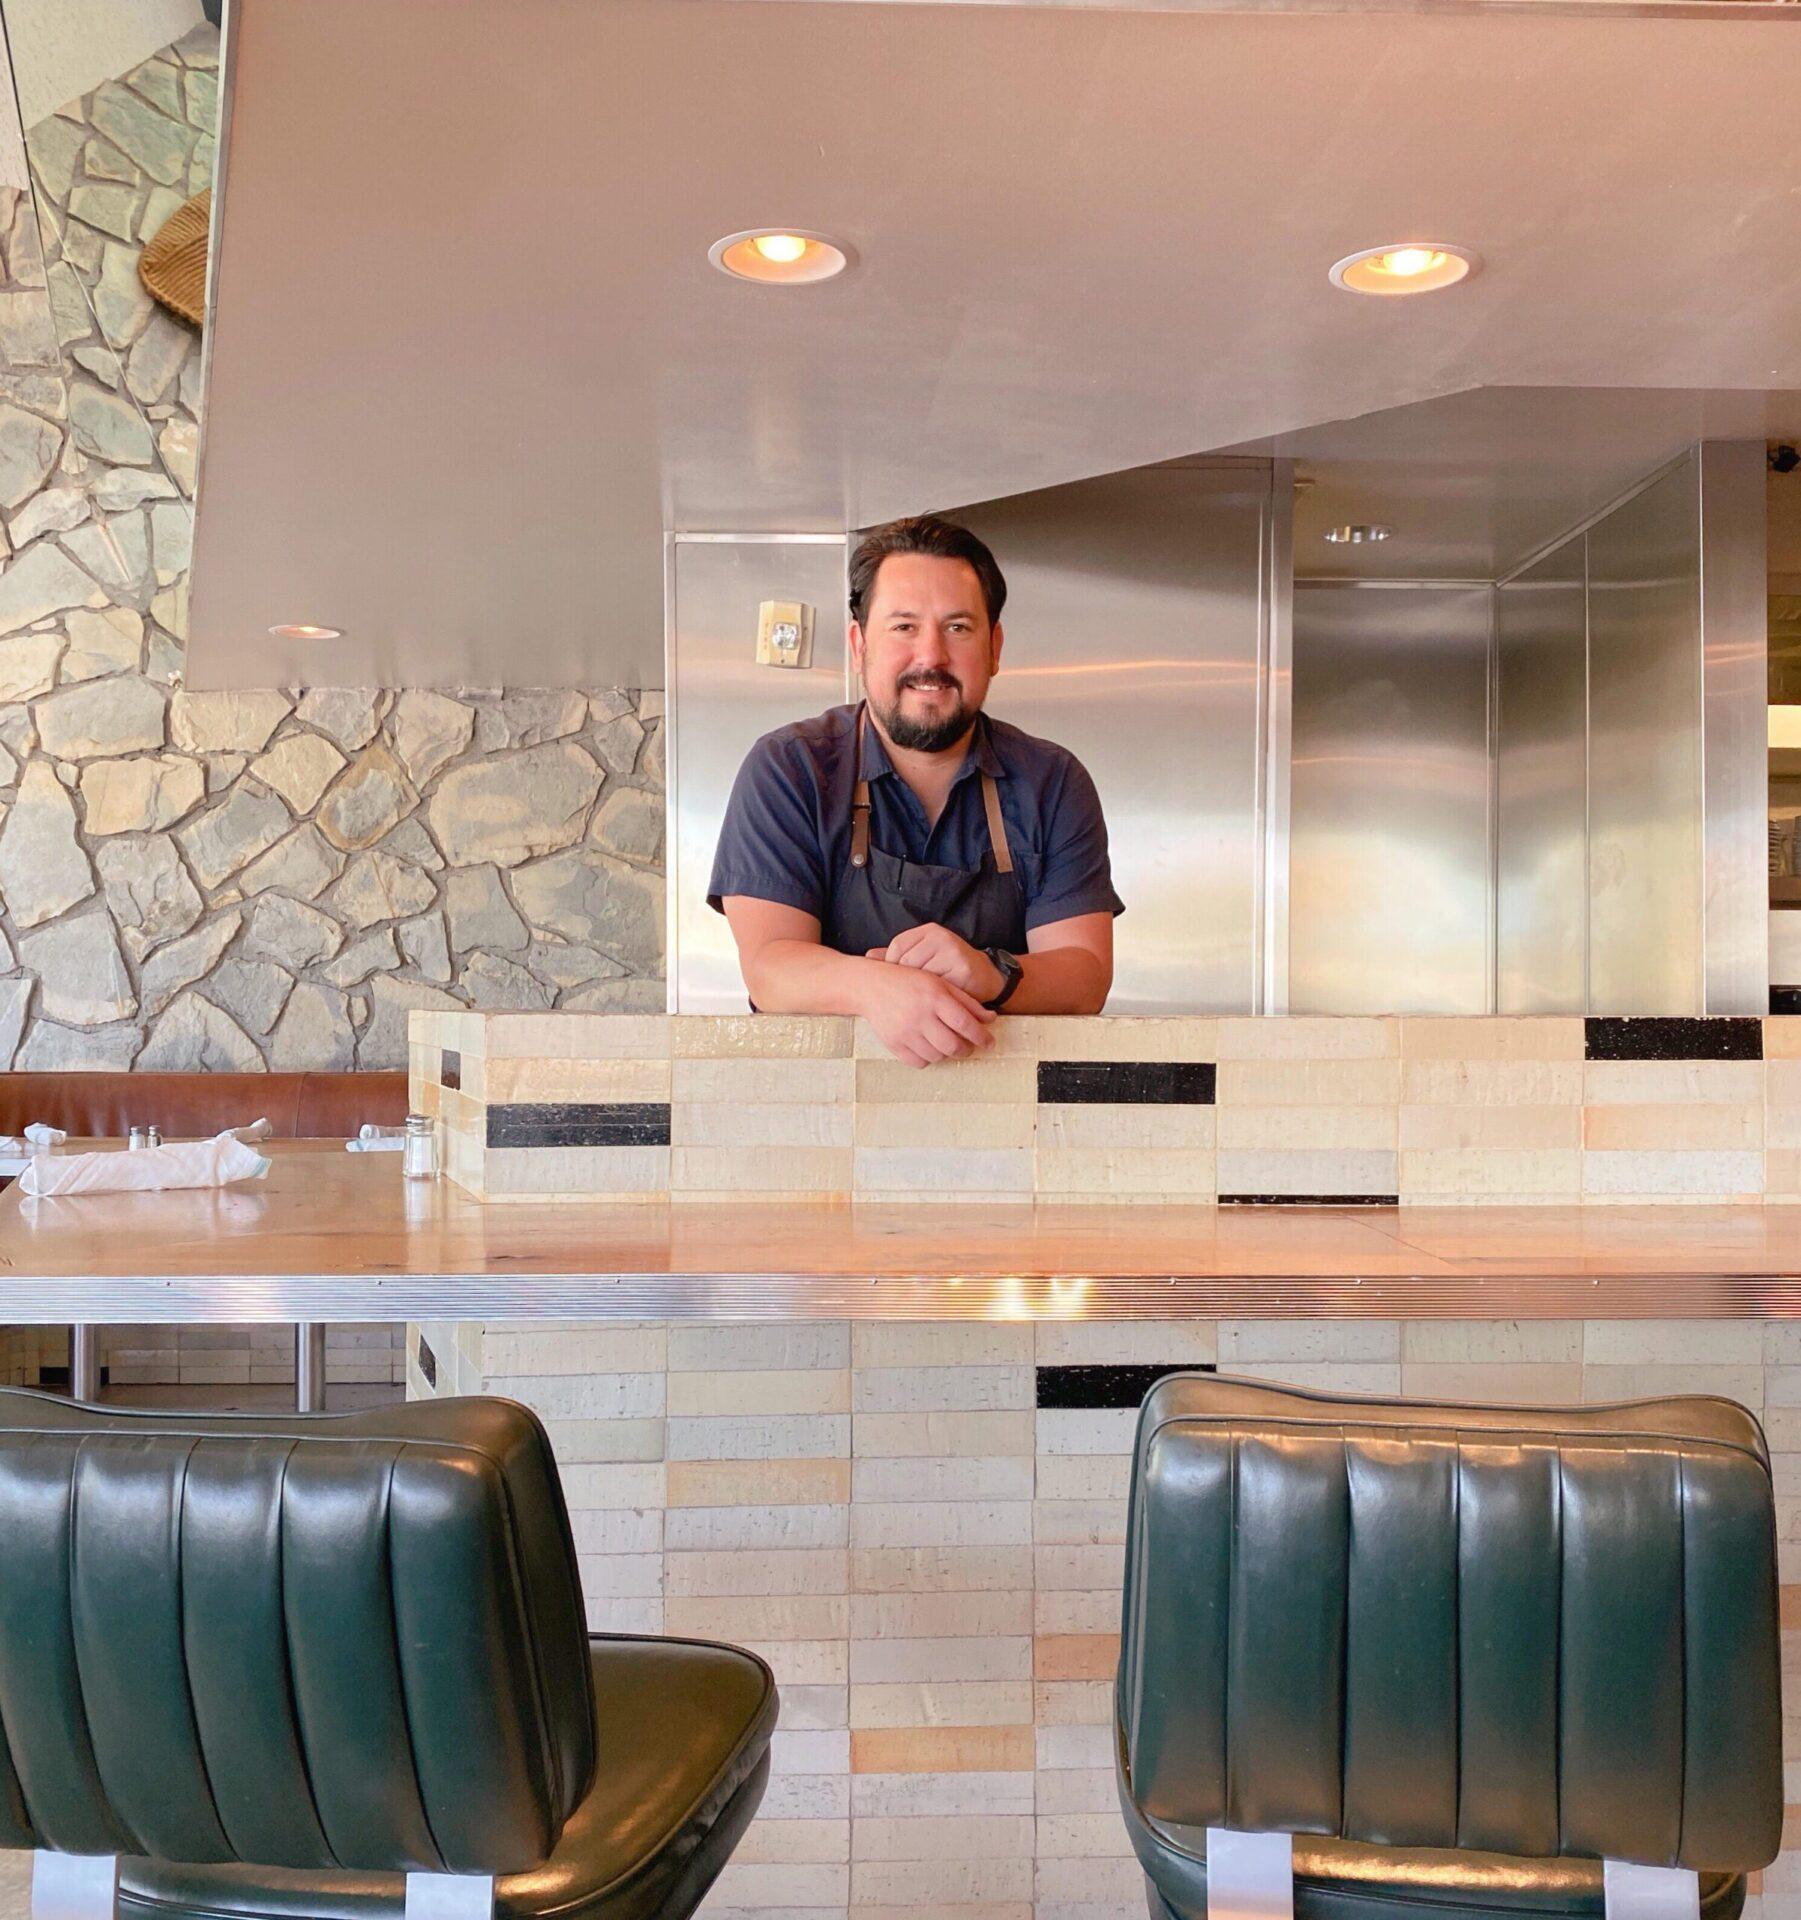 Executive Chef Ysaac Ramirez at Ace Hotel palm springs